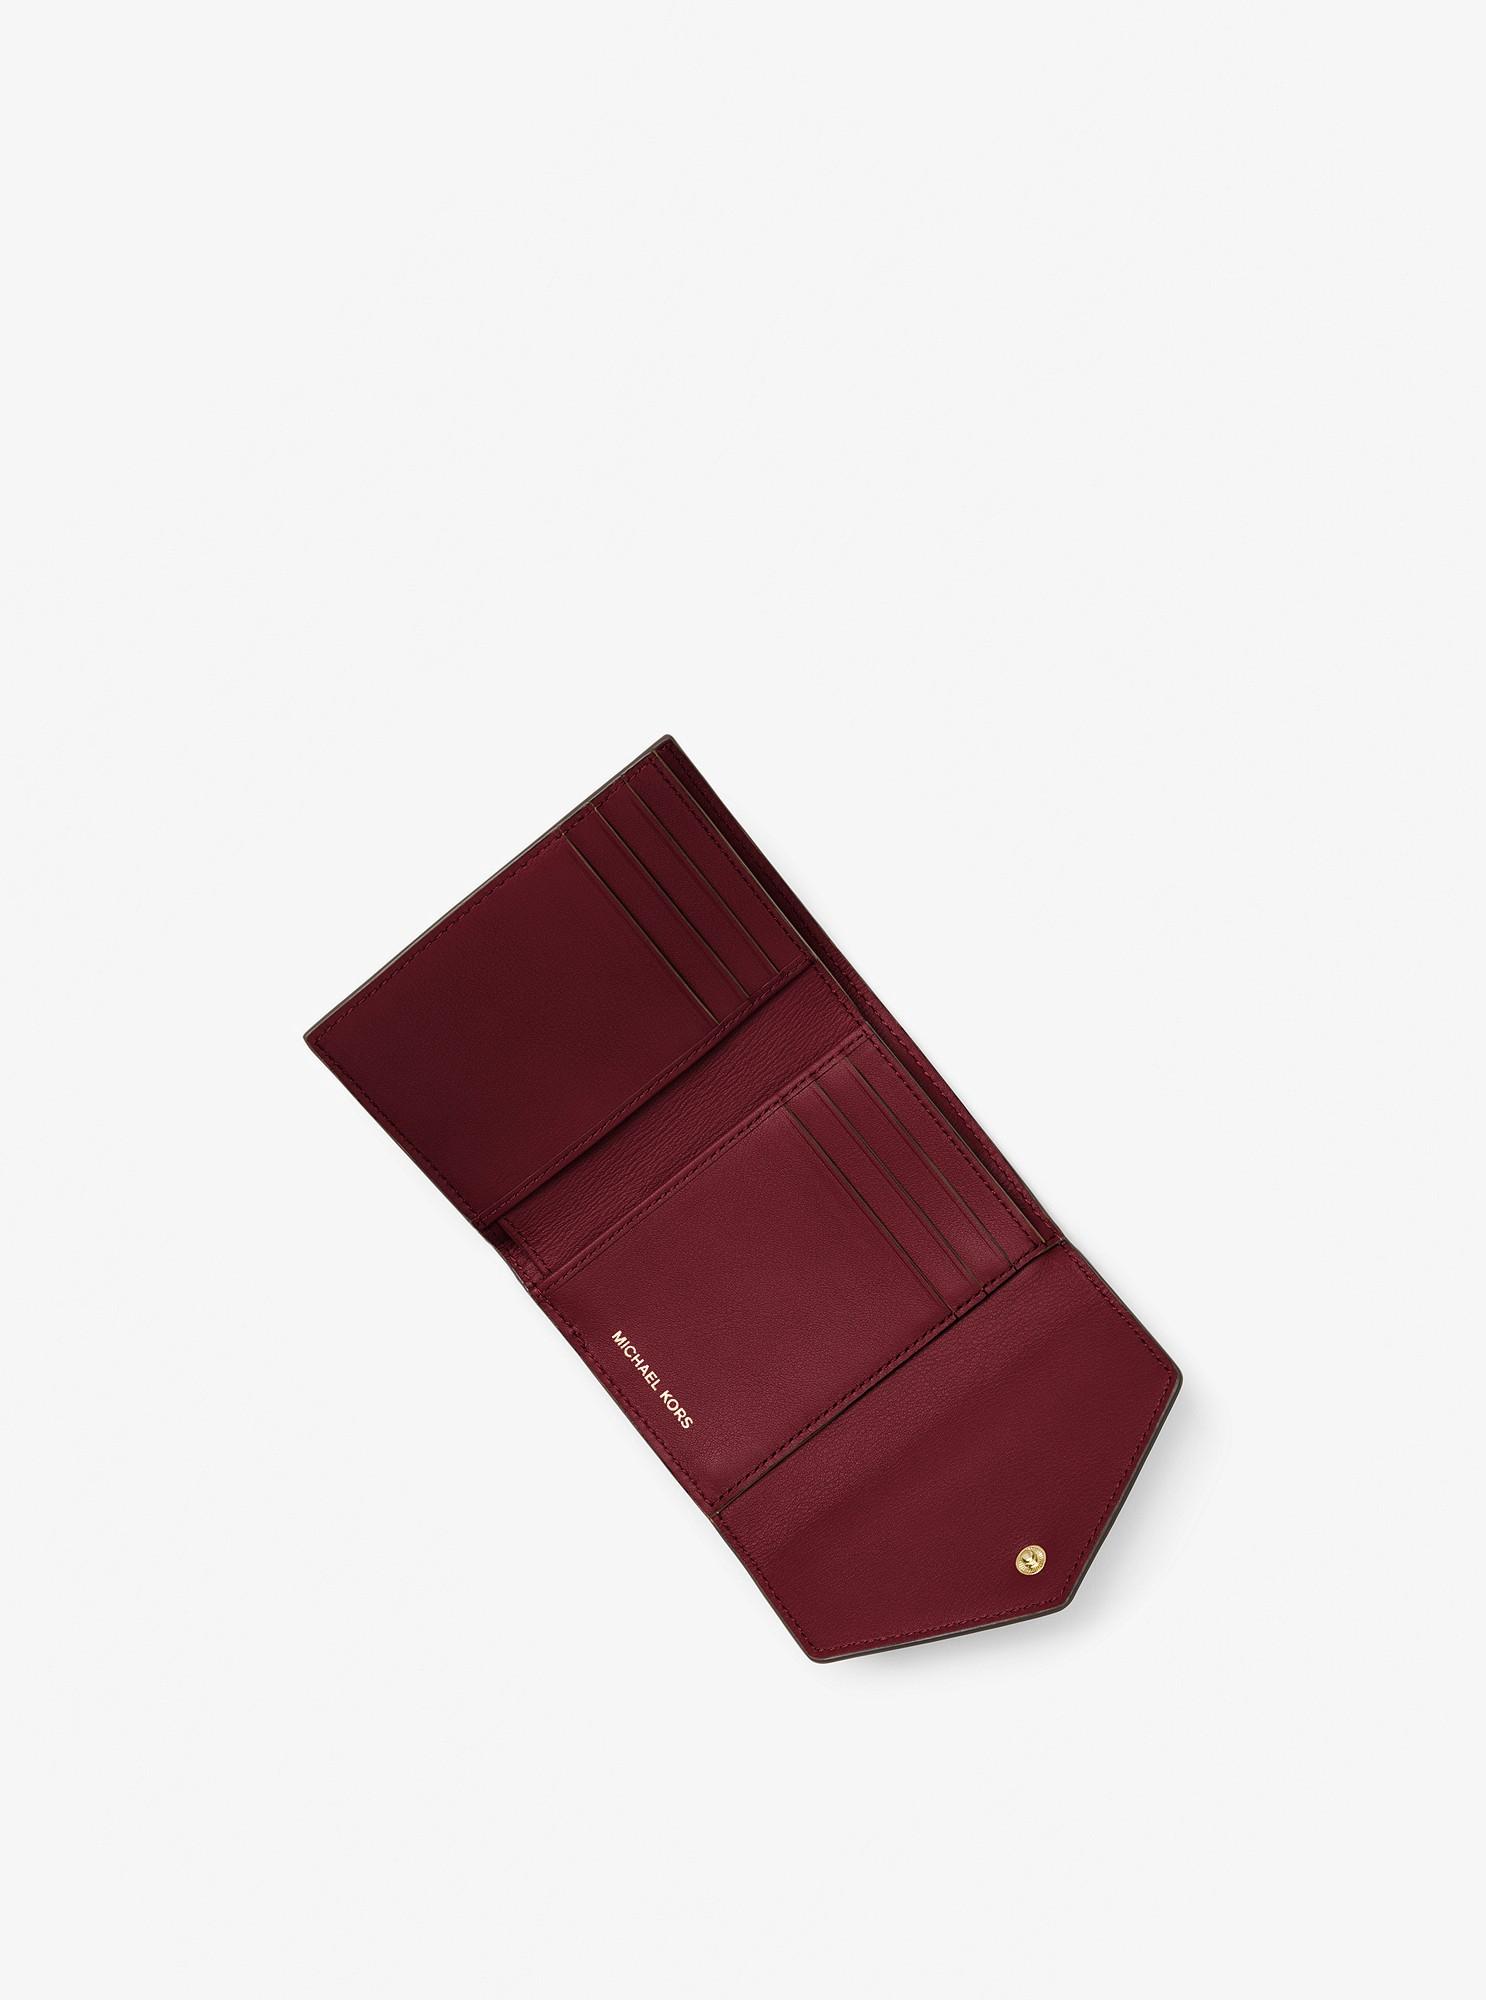 ffdd865d05574a Michael Kors Jet Set Small Leather Envelope Wallet - Oxblood ...